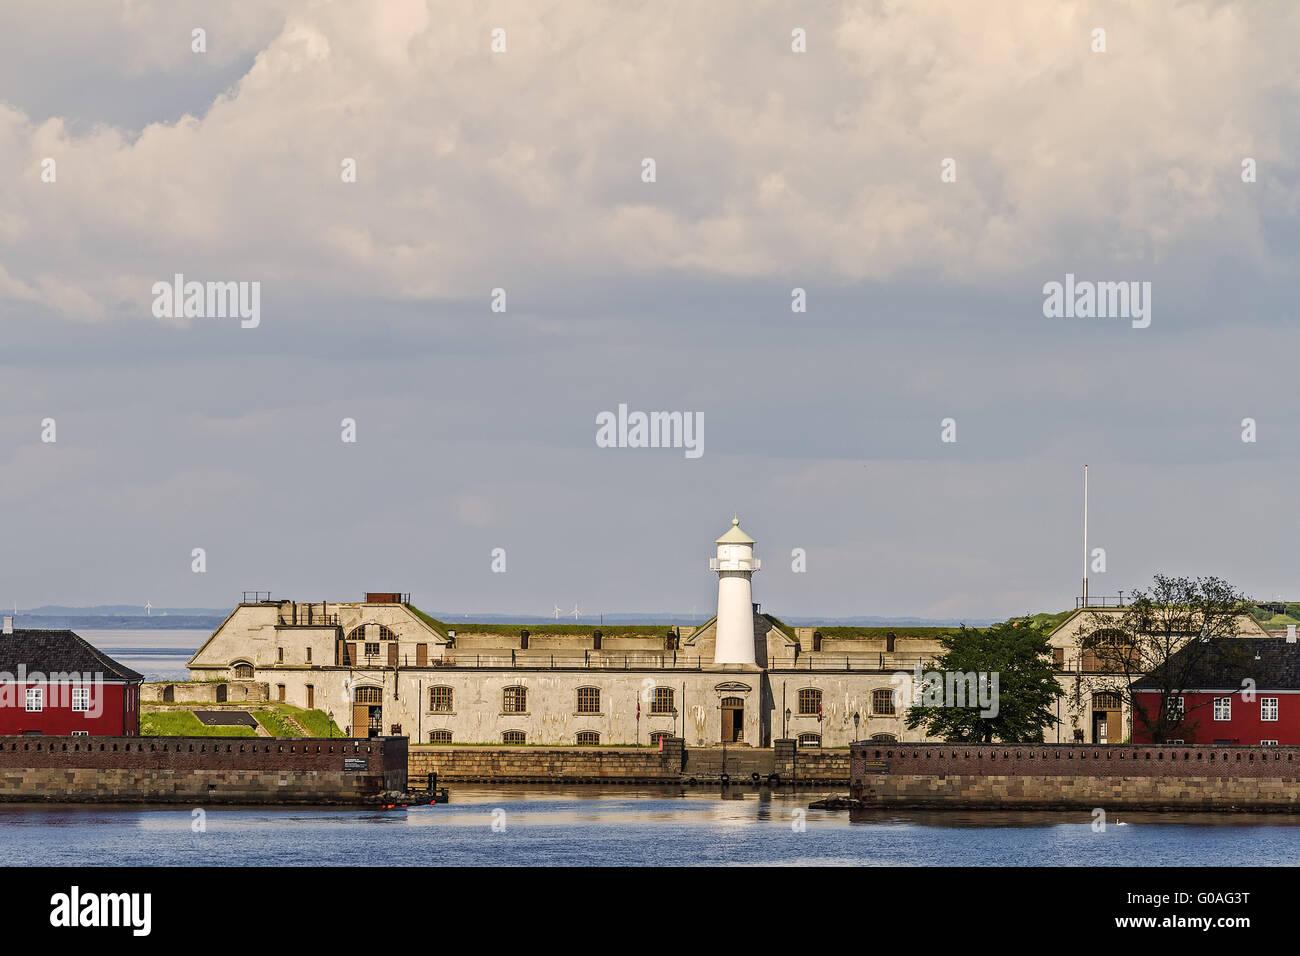 The Lighthouse In The Harbour At Copenhagen Denmar - Stock Image